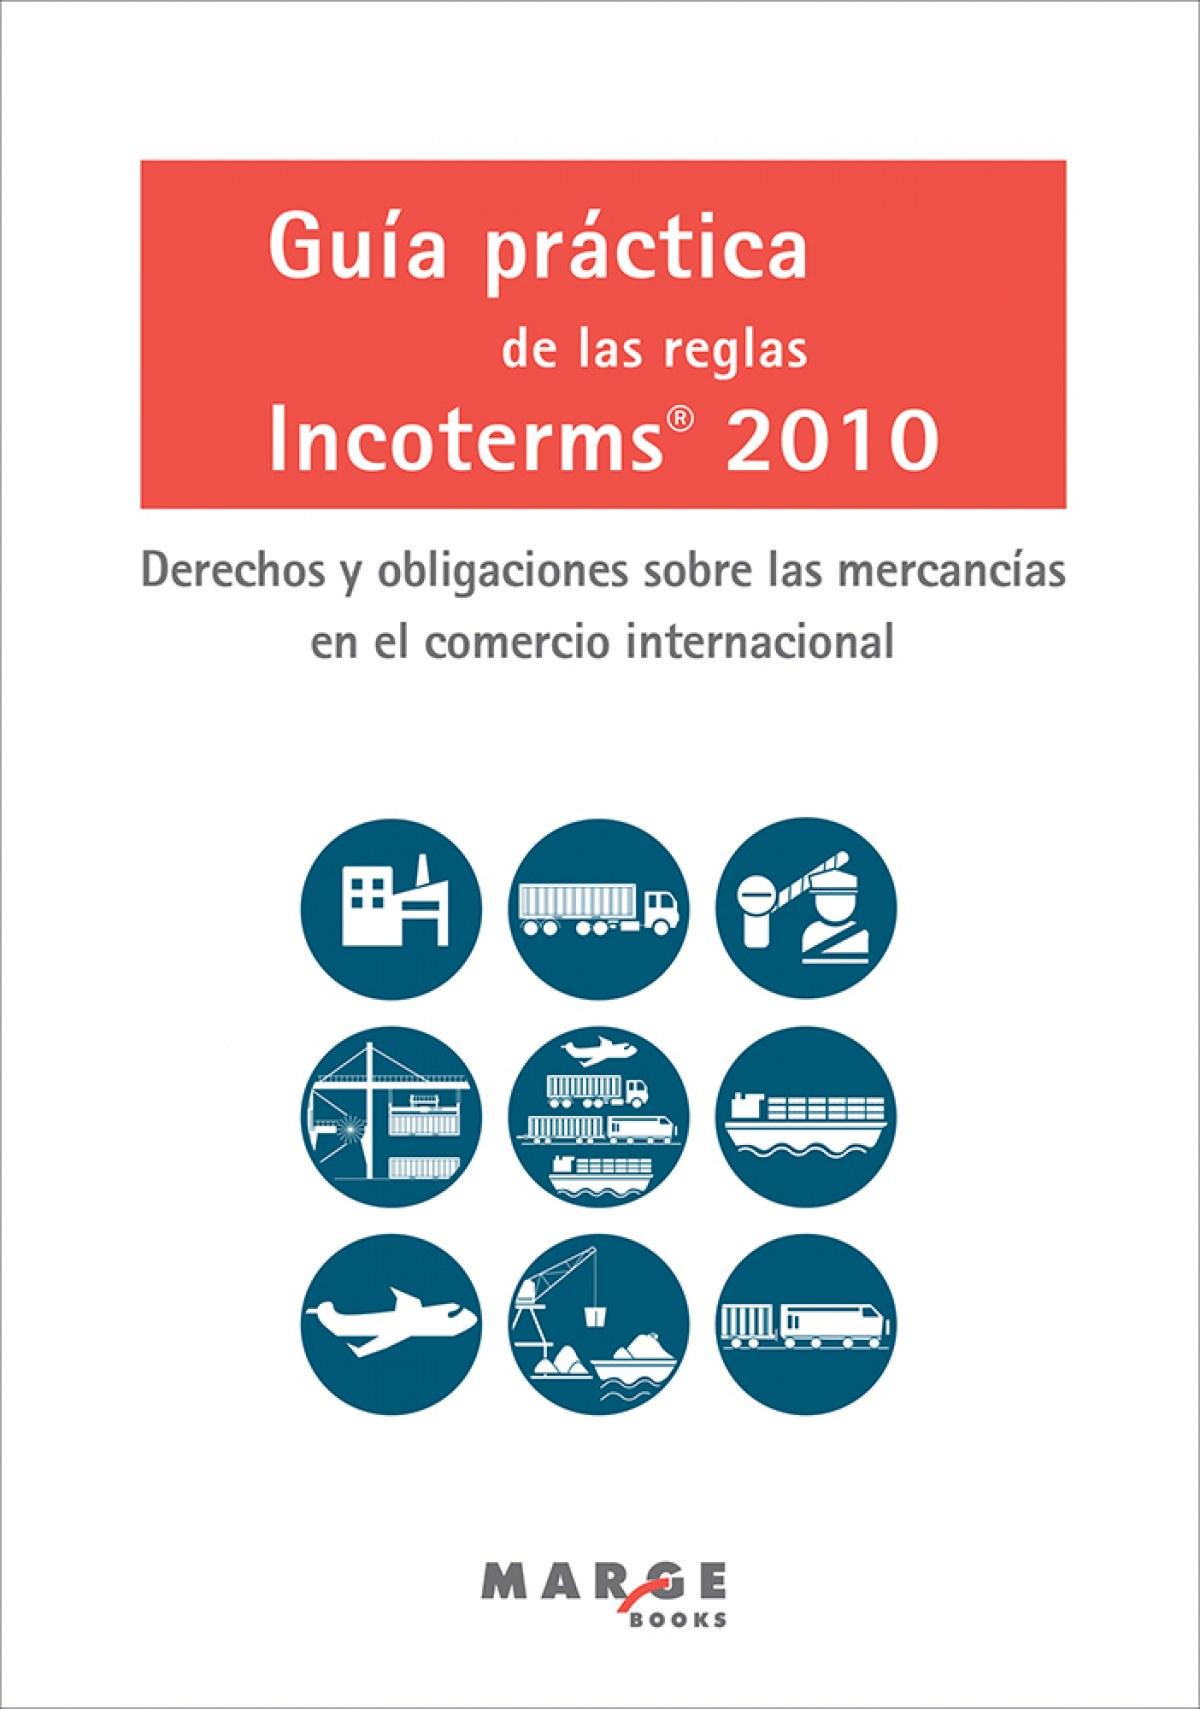 Guía práctica reglas incoterms 2010